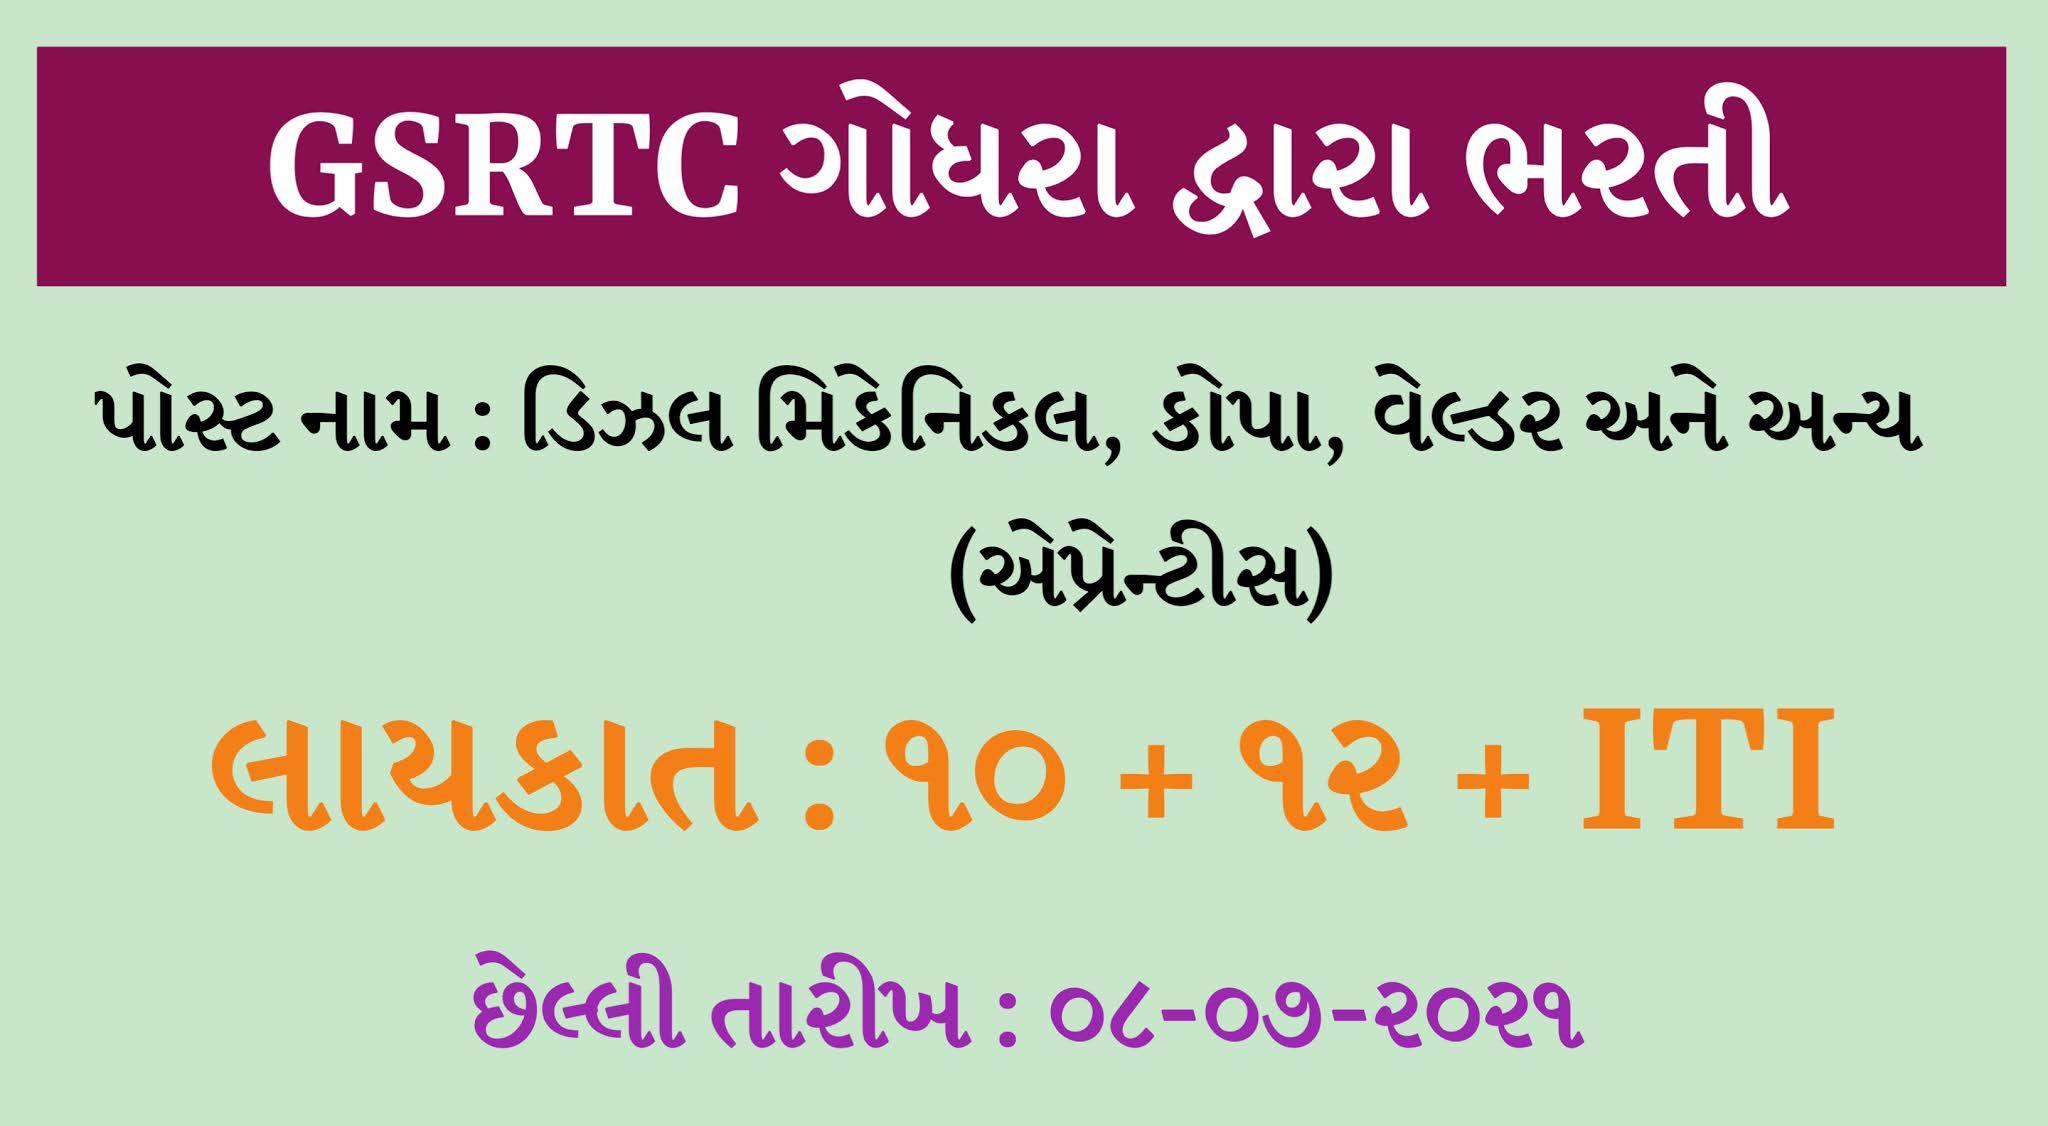 GSRTC Ahmedabad Recruitment 2021,GSRTC Ahmedabad Recruitment 2021,